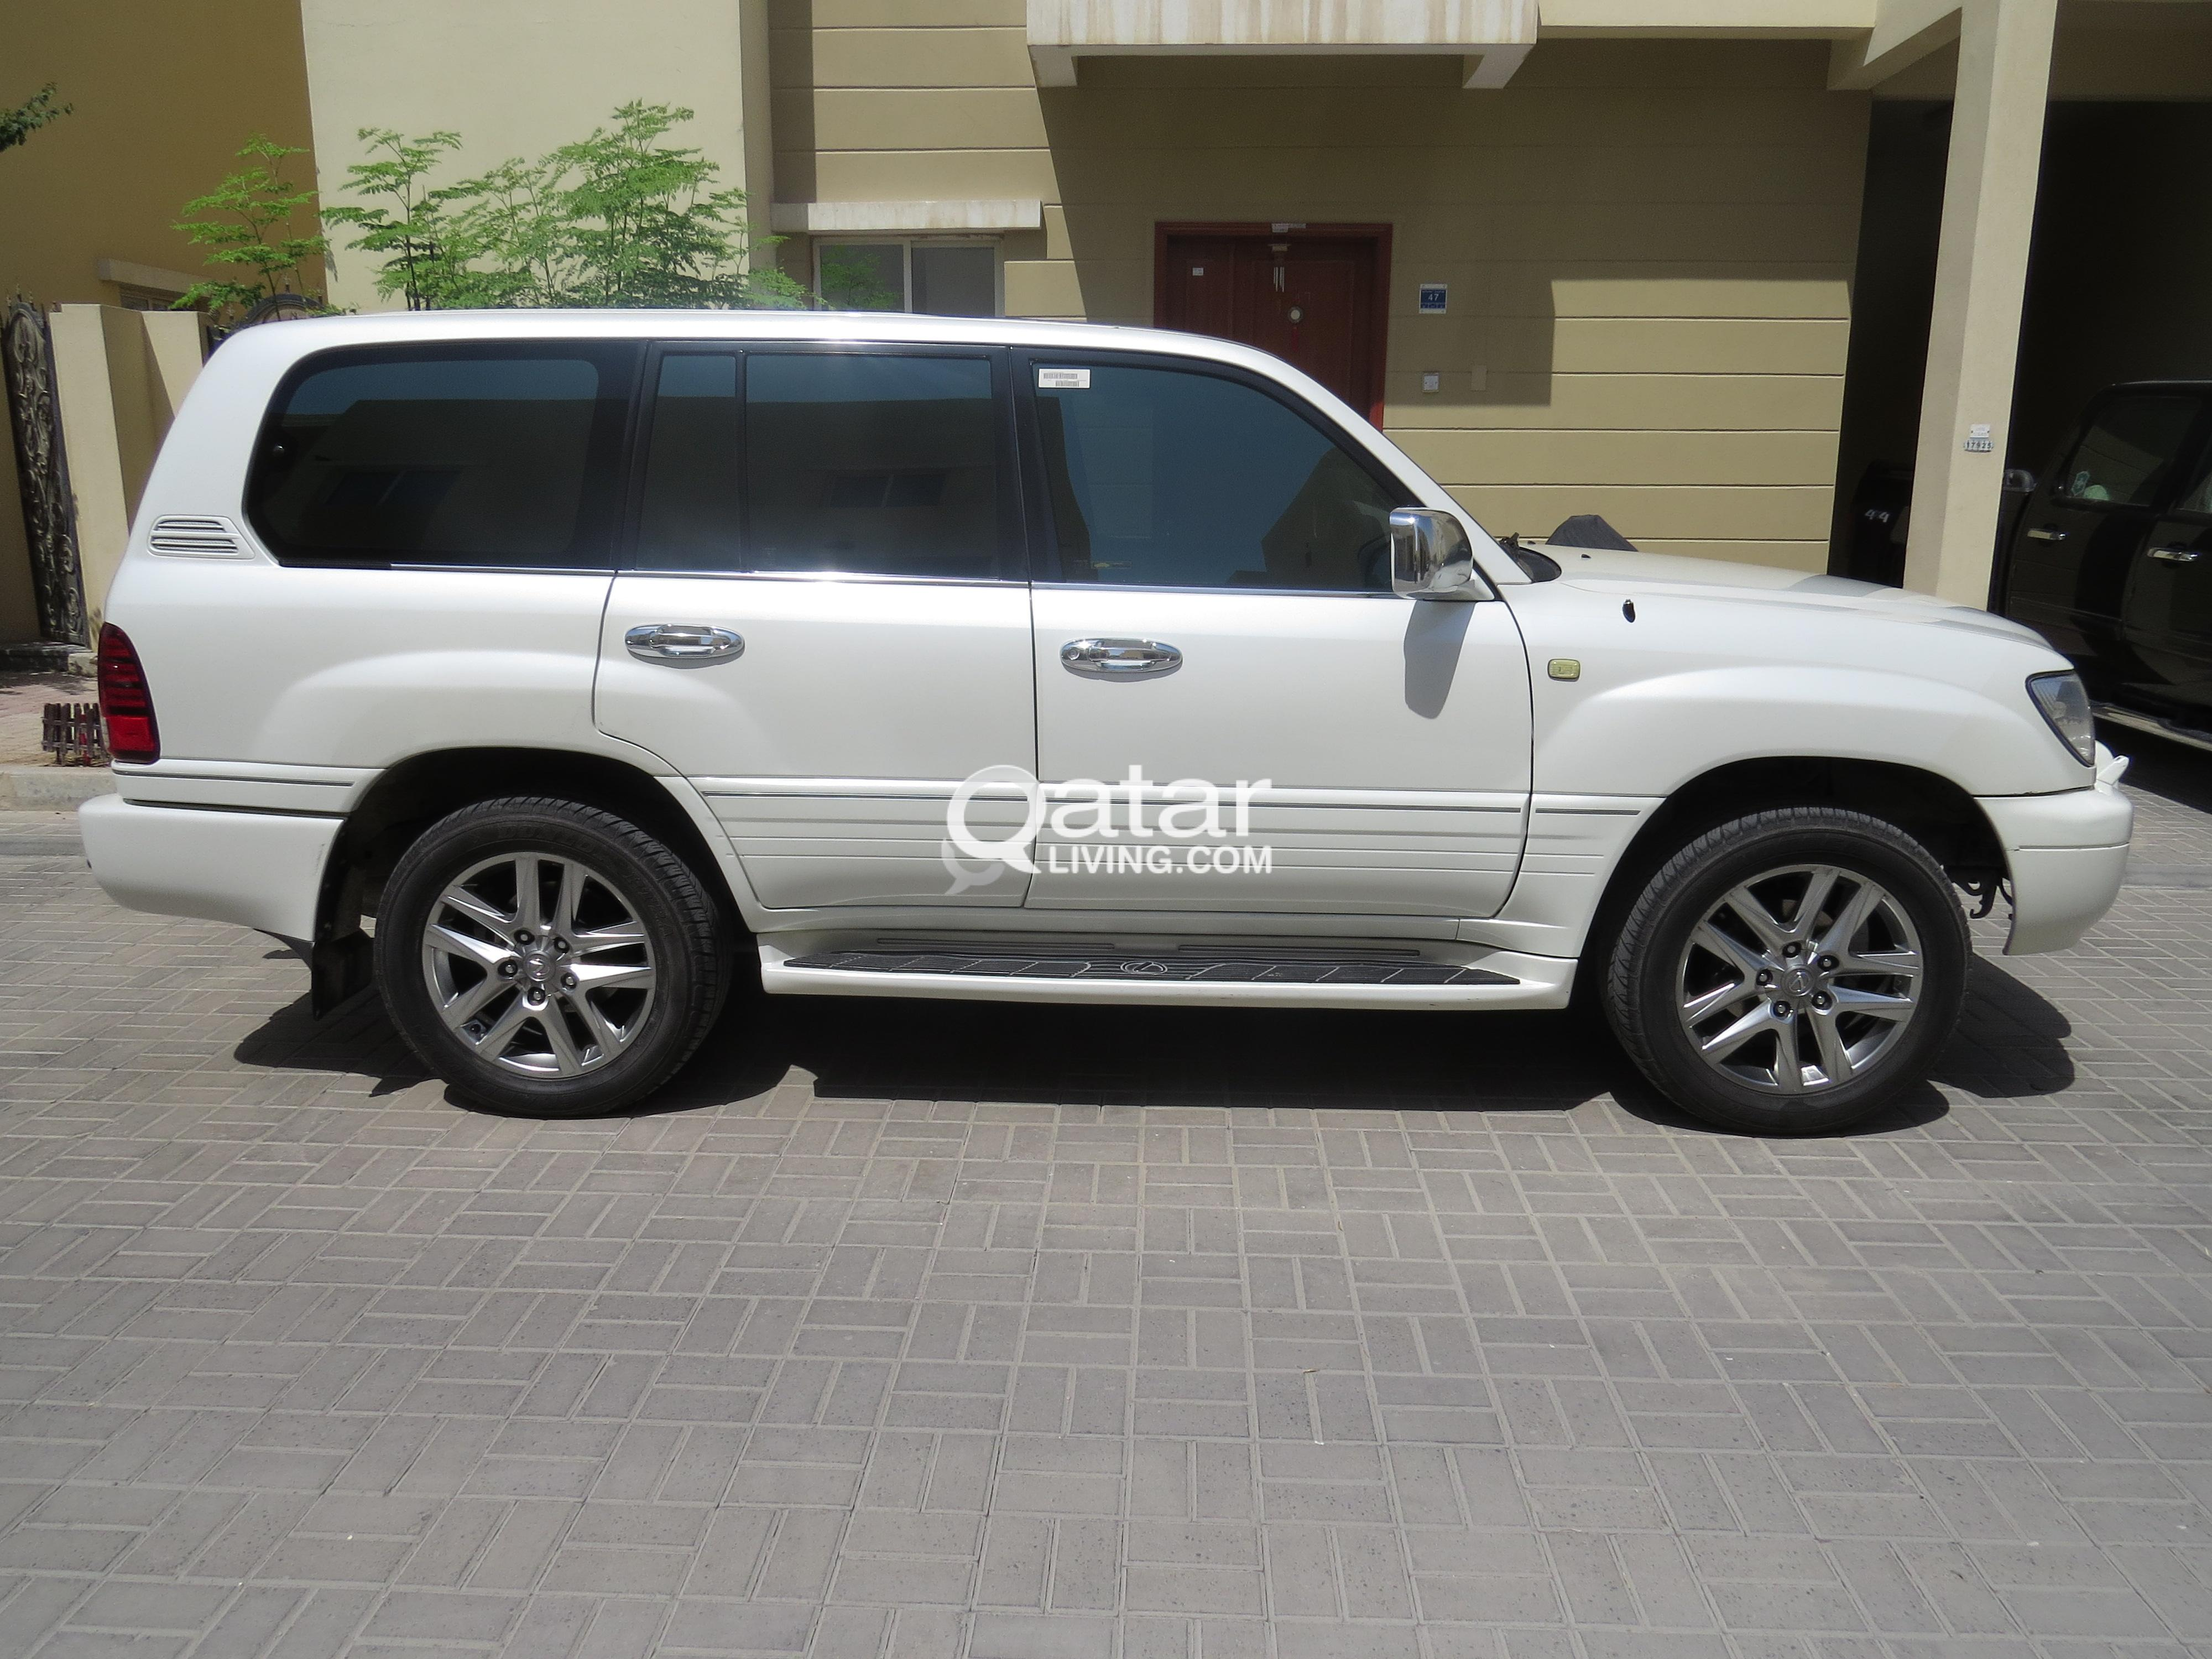 sale advert lx for vehicles white living lexus qatar title